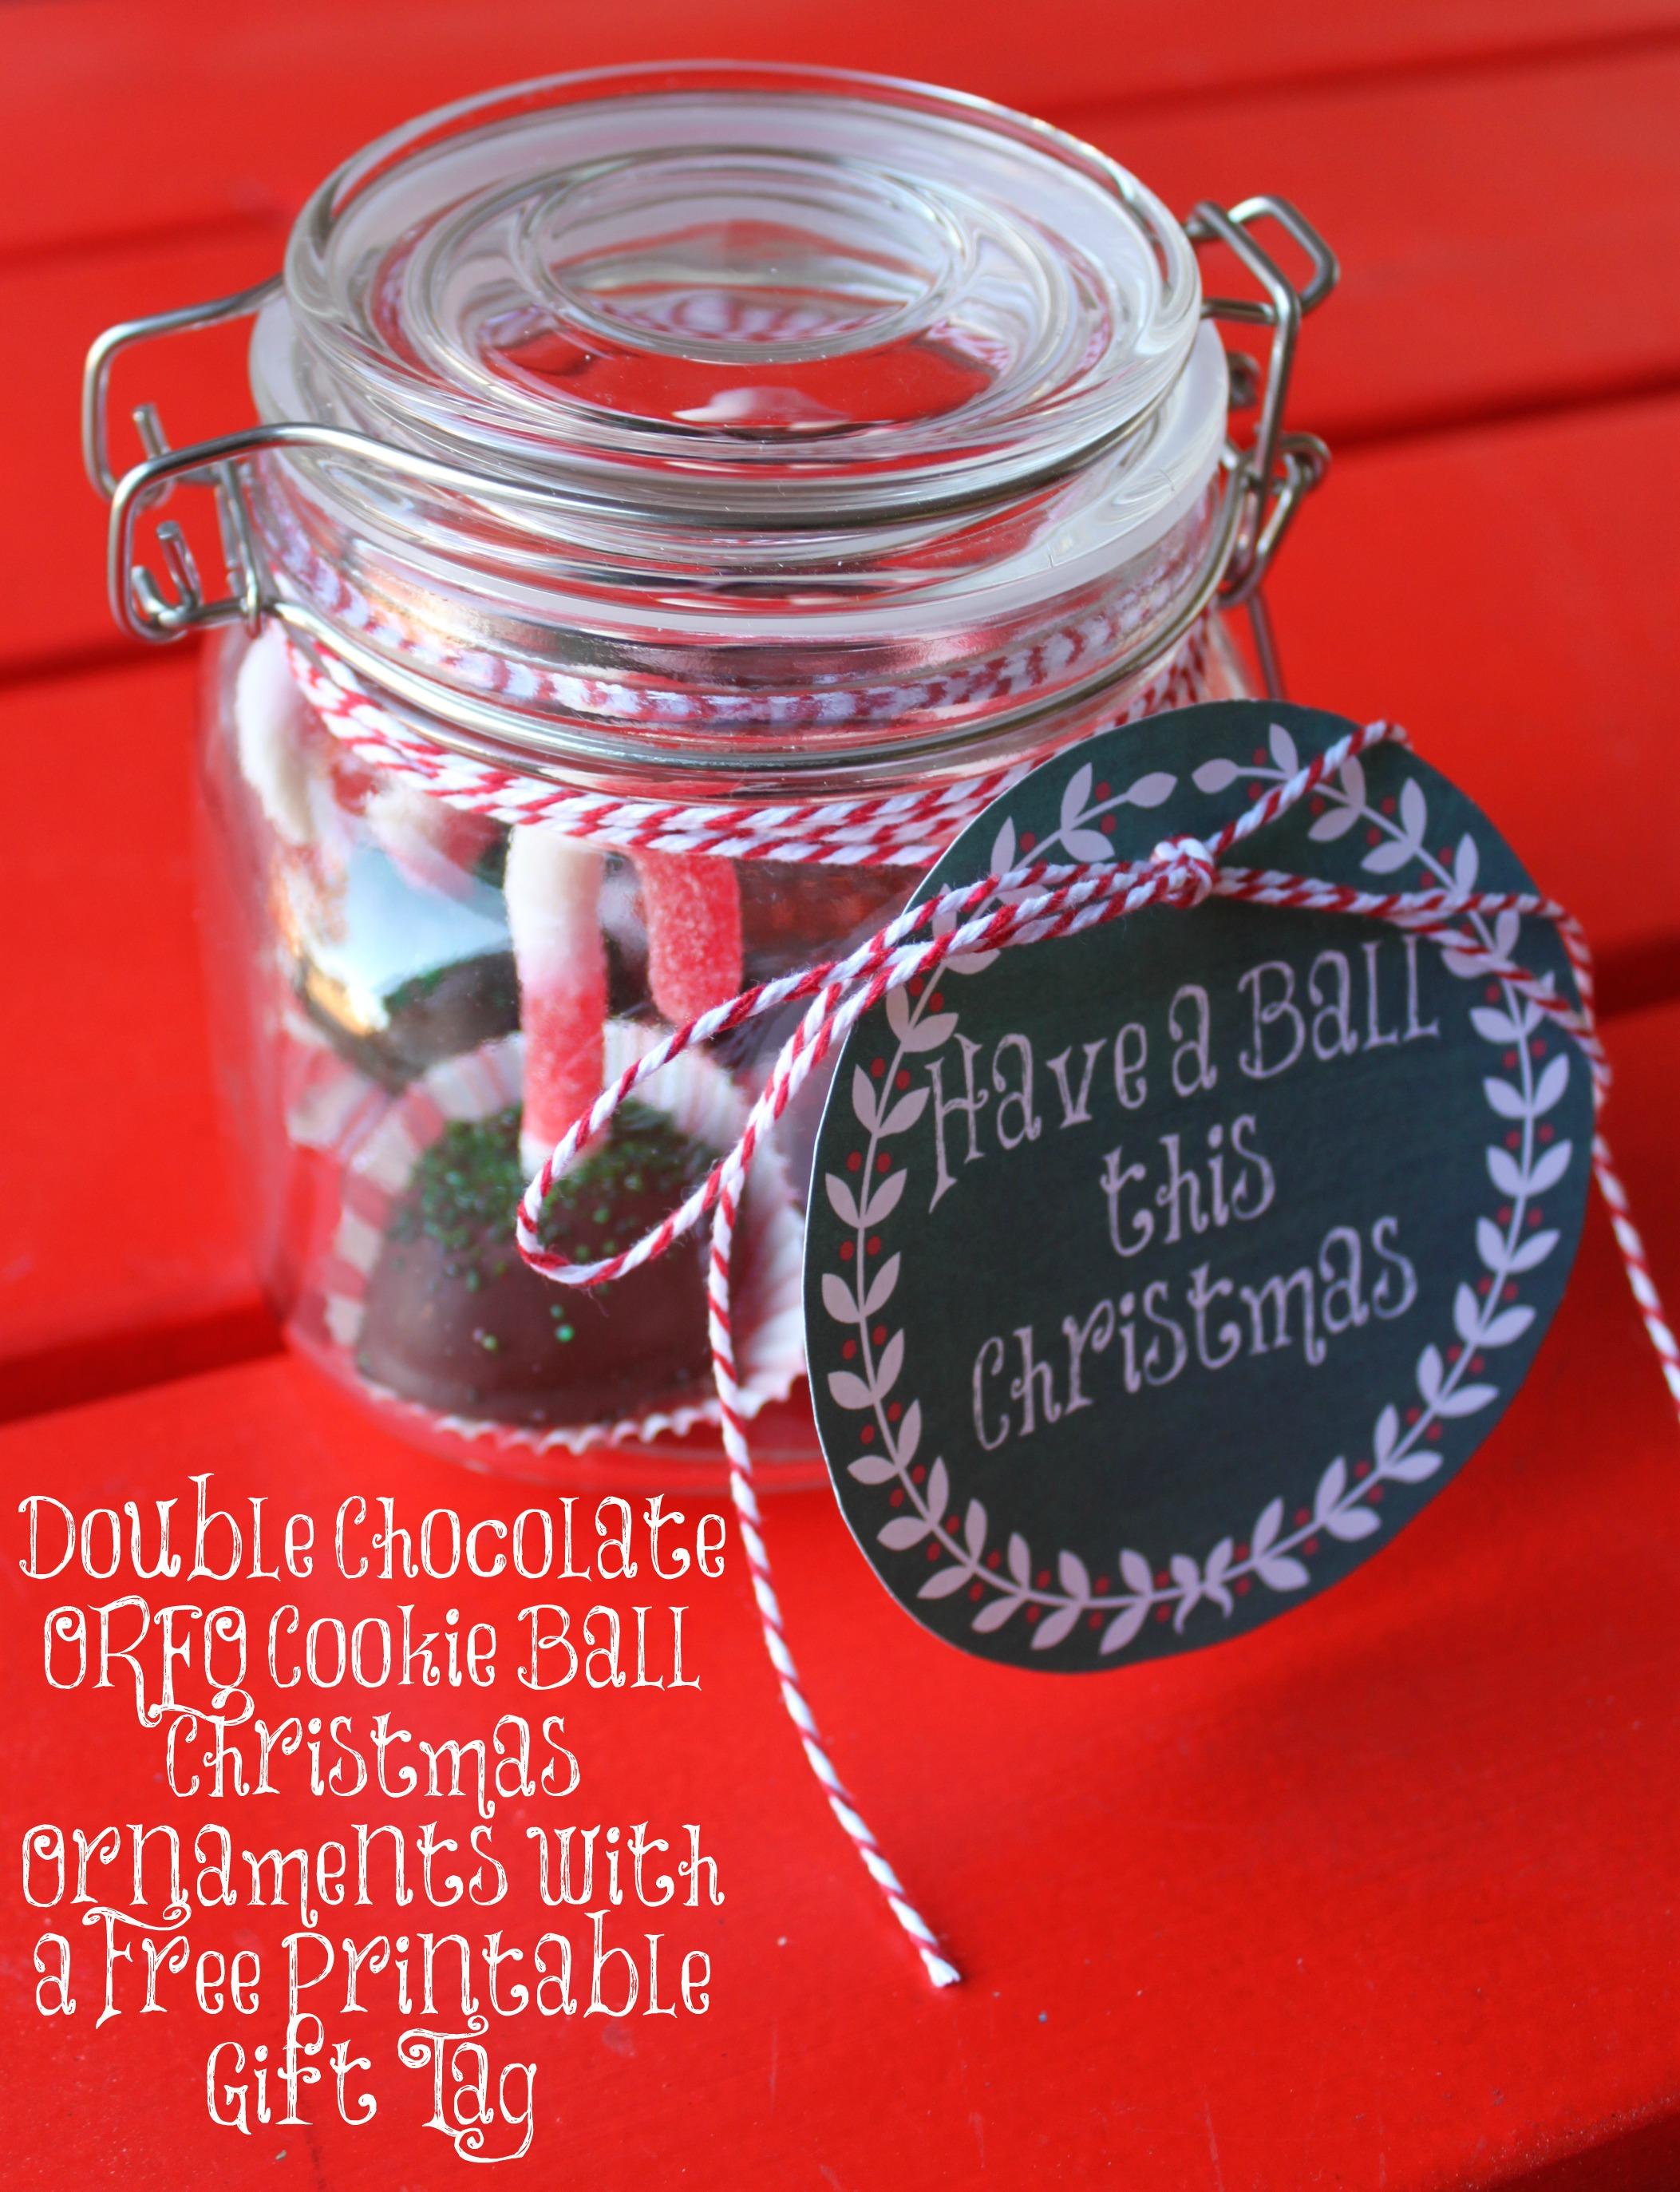 Double Chocolate OREO Cookie Ball